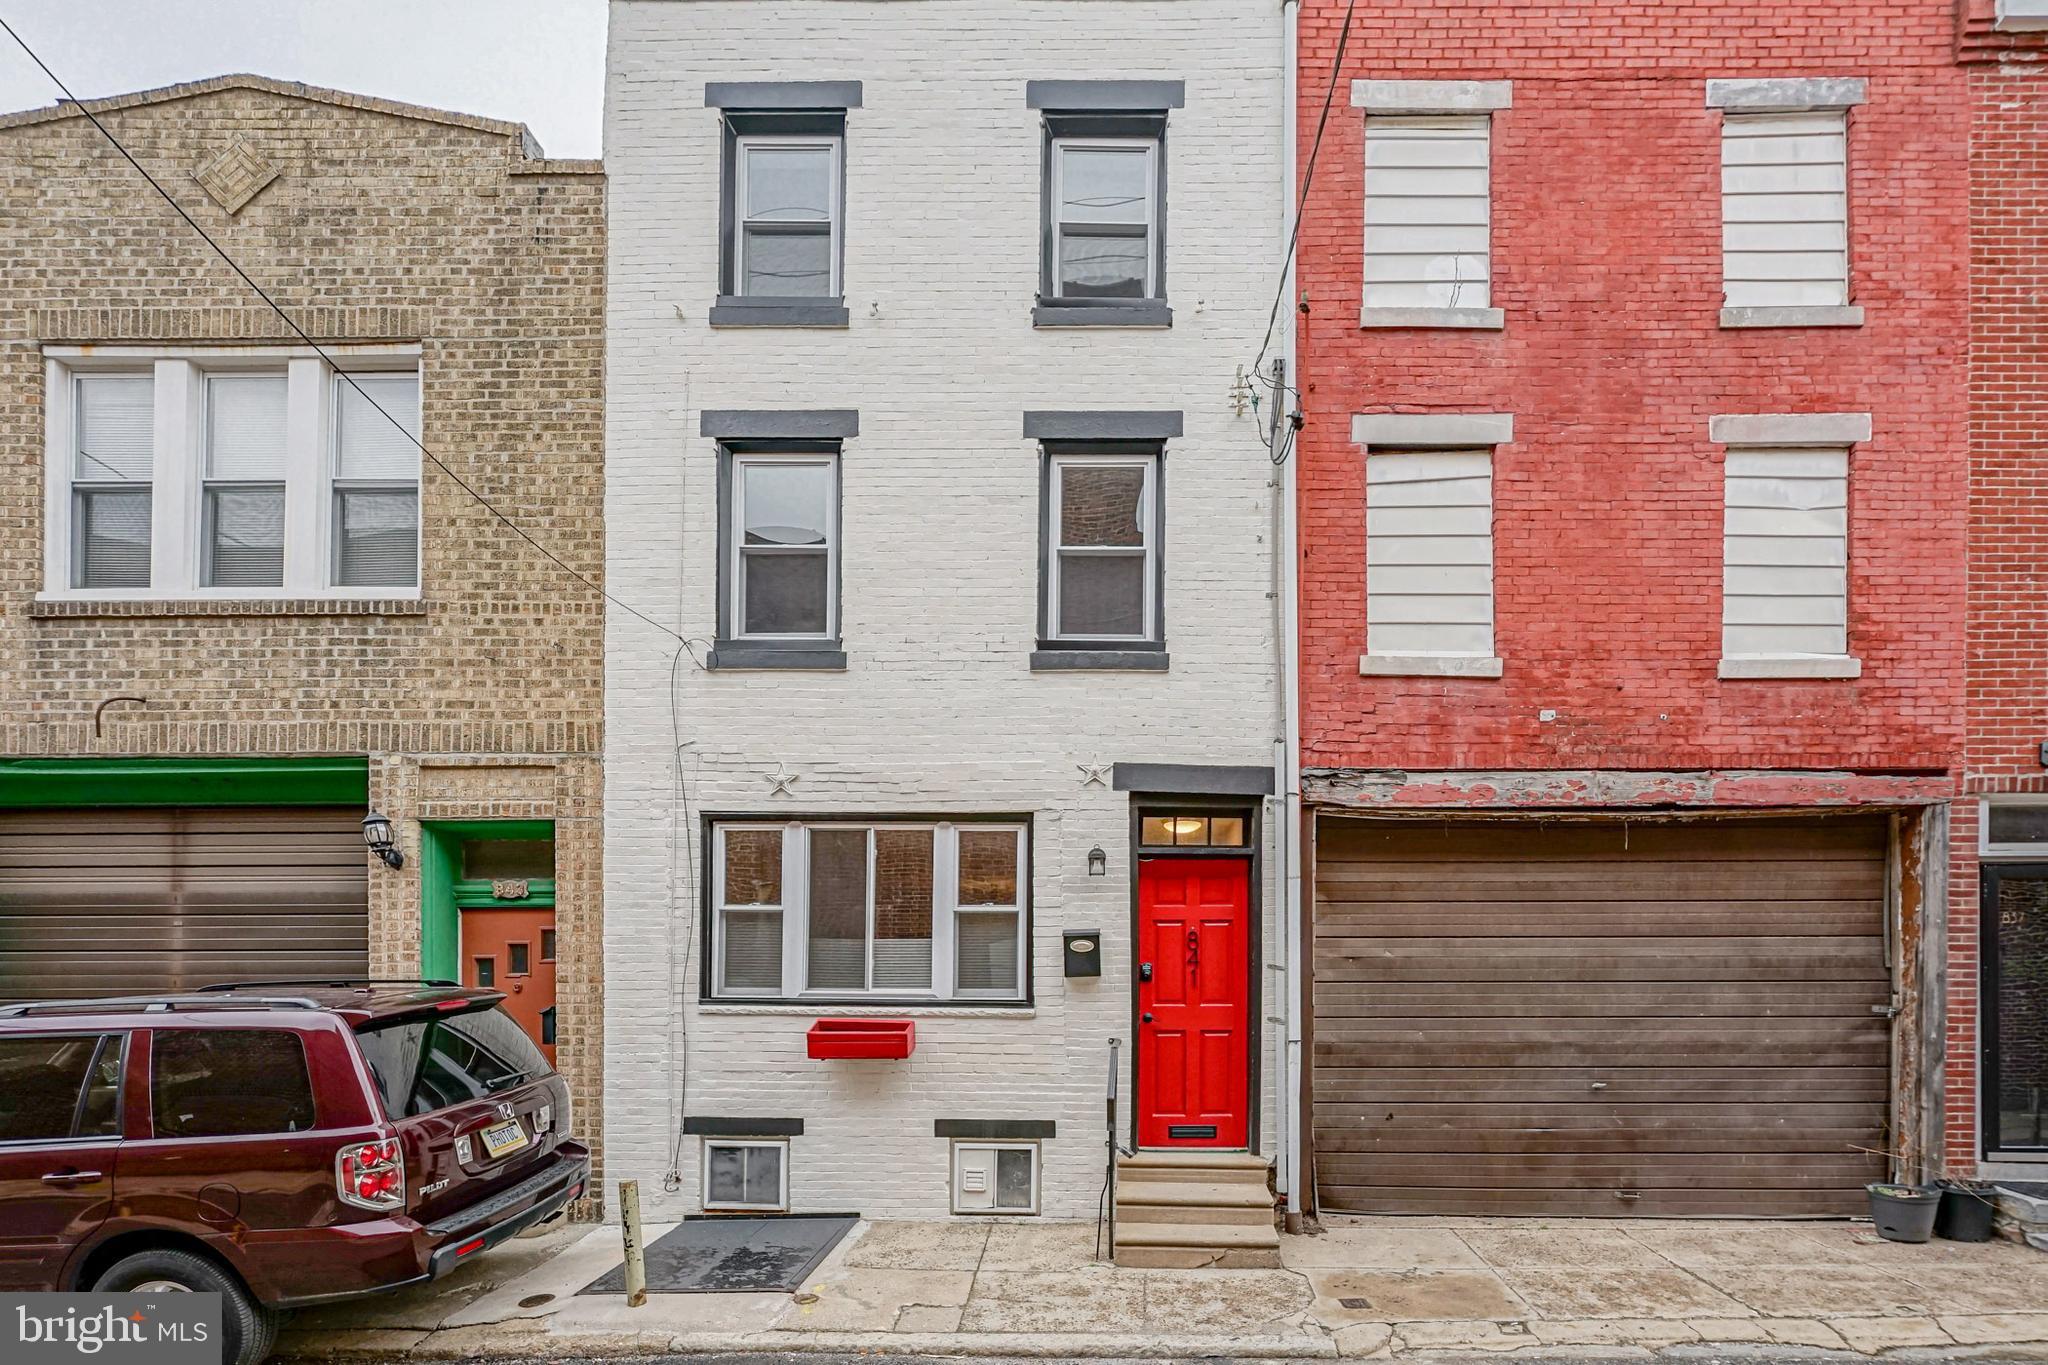 841 Kimball Street, Philadelphia, PA 19147